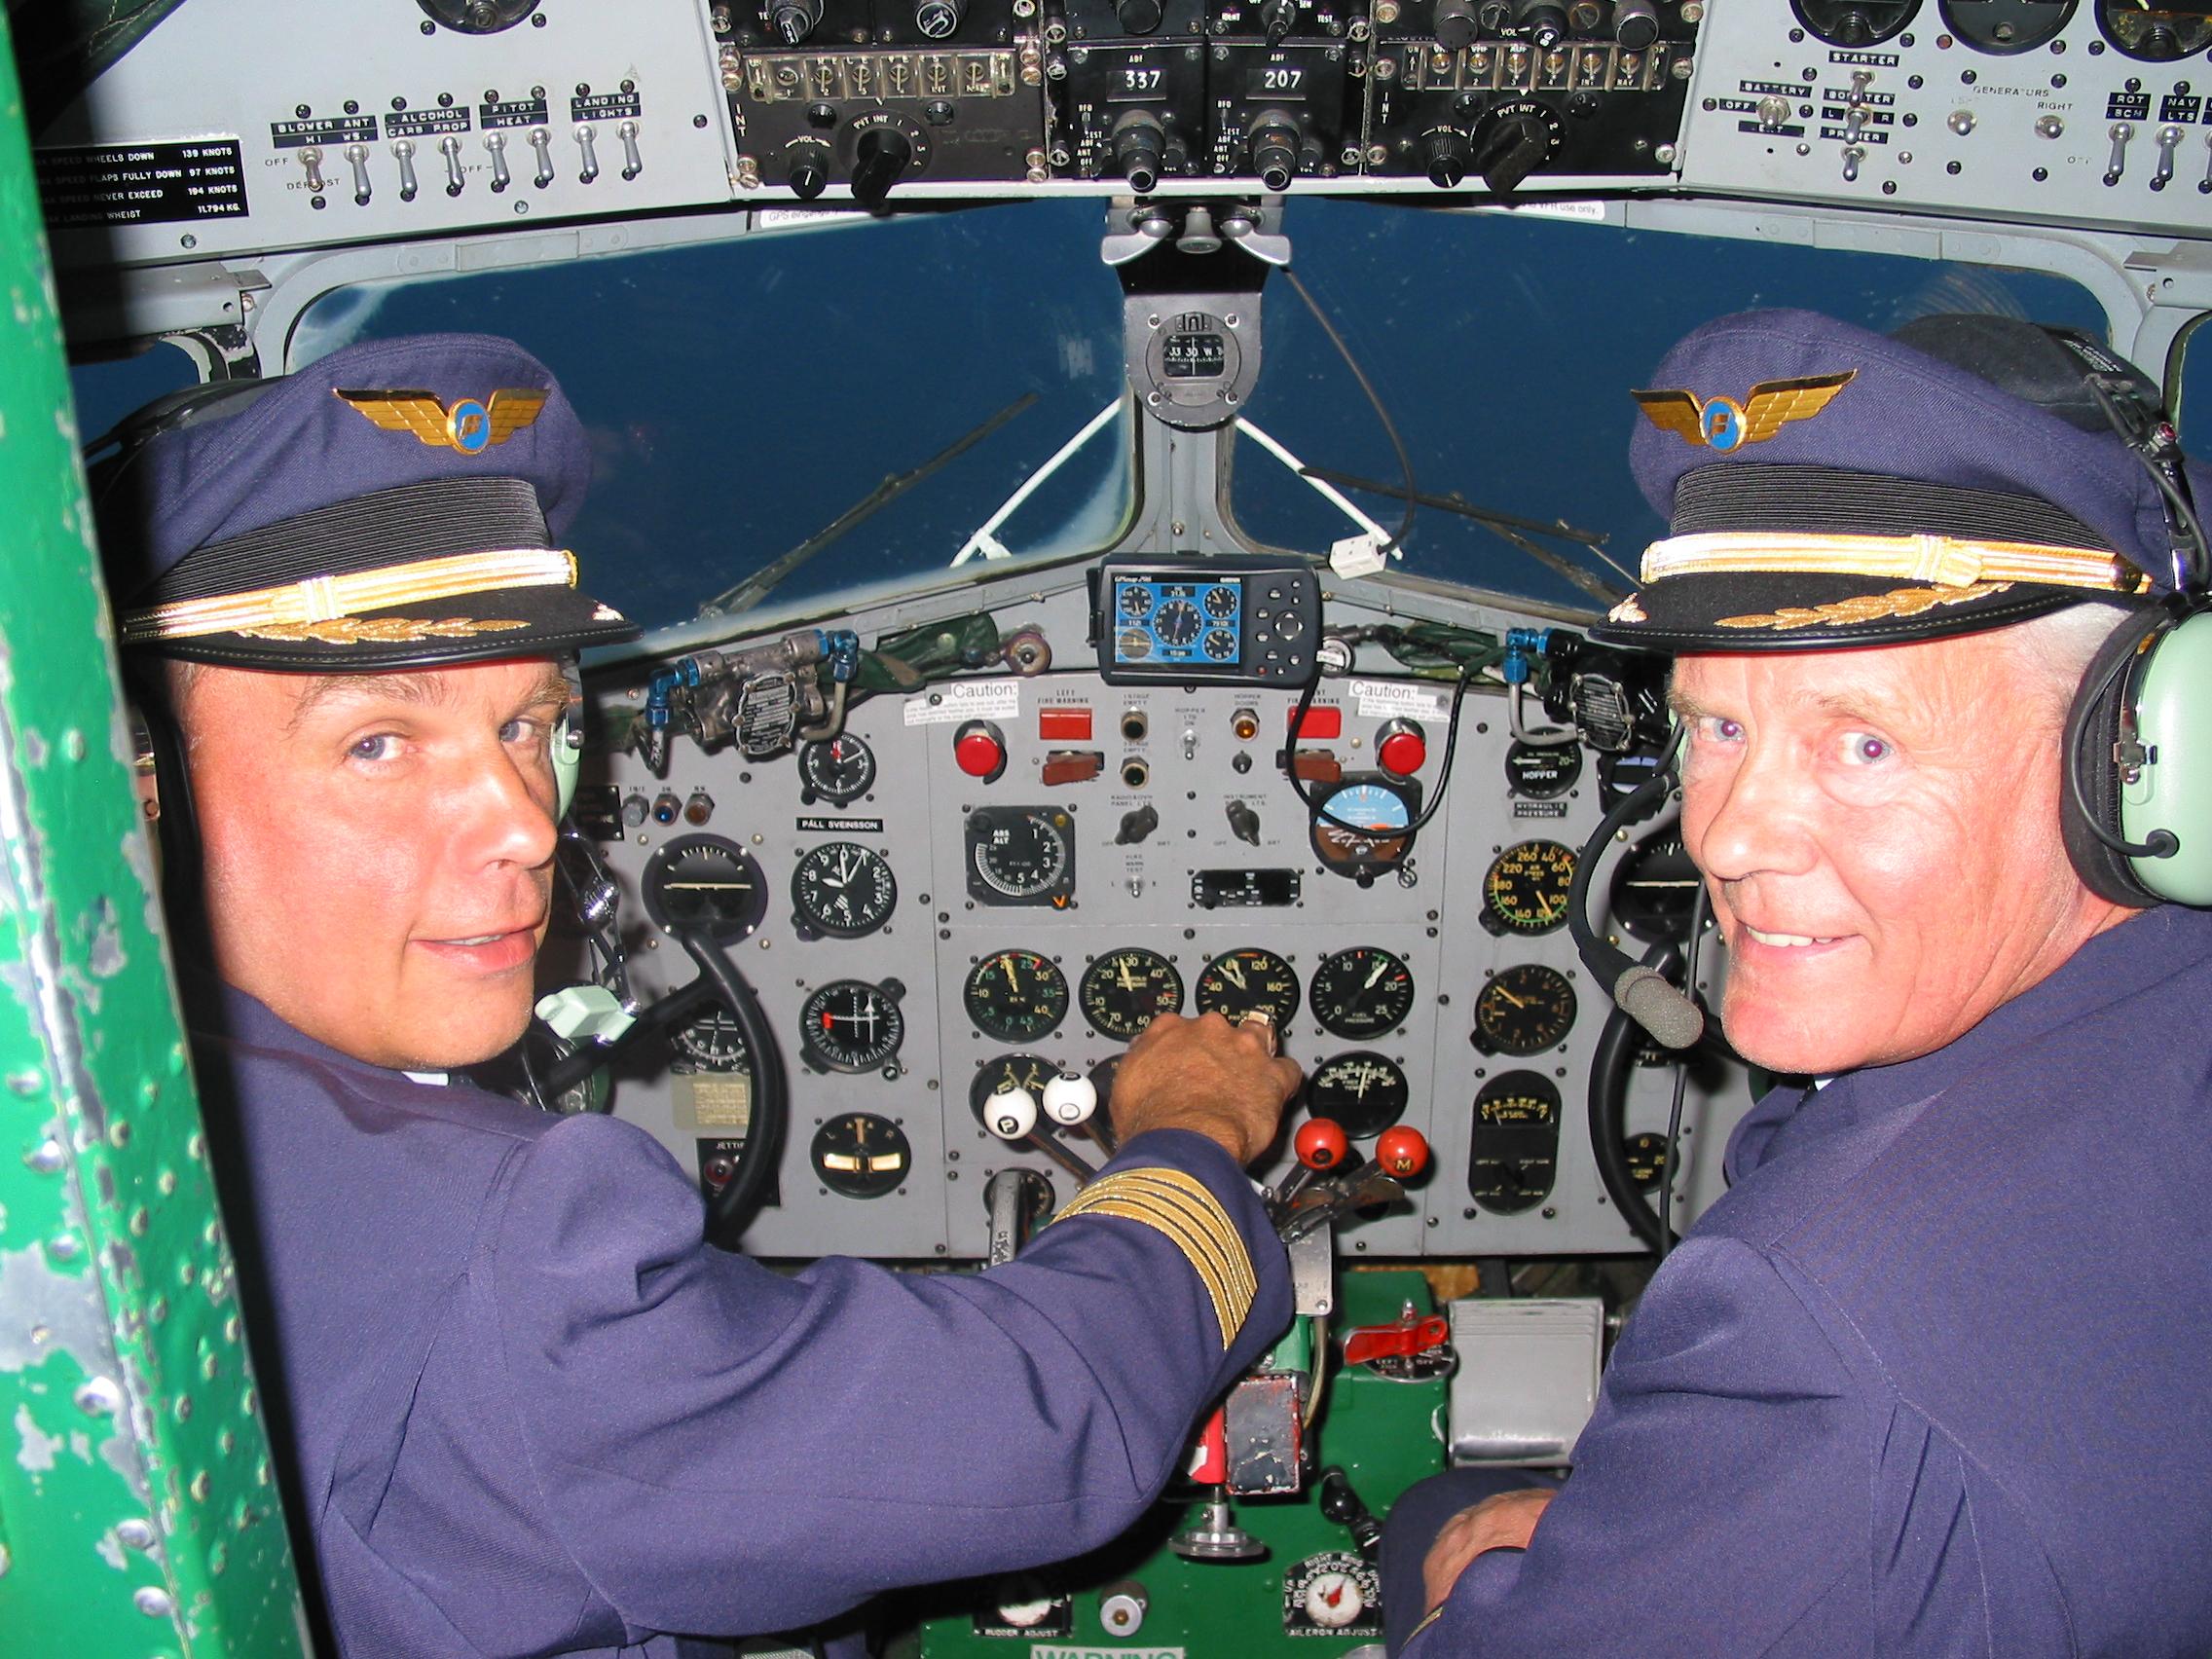 Tómas Dagur Helgason and Páll Stefánsson in DC-3 (TF-NPK) cockpit during flight from Stavanger to Keflavík // Source: Tómas Dagur Helgason